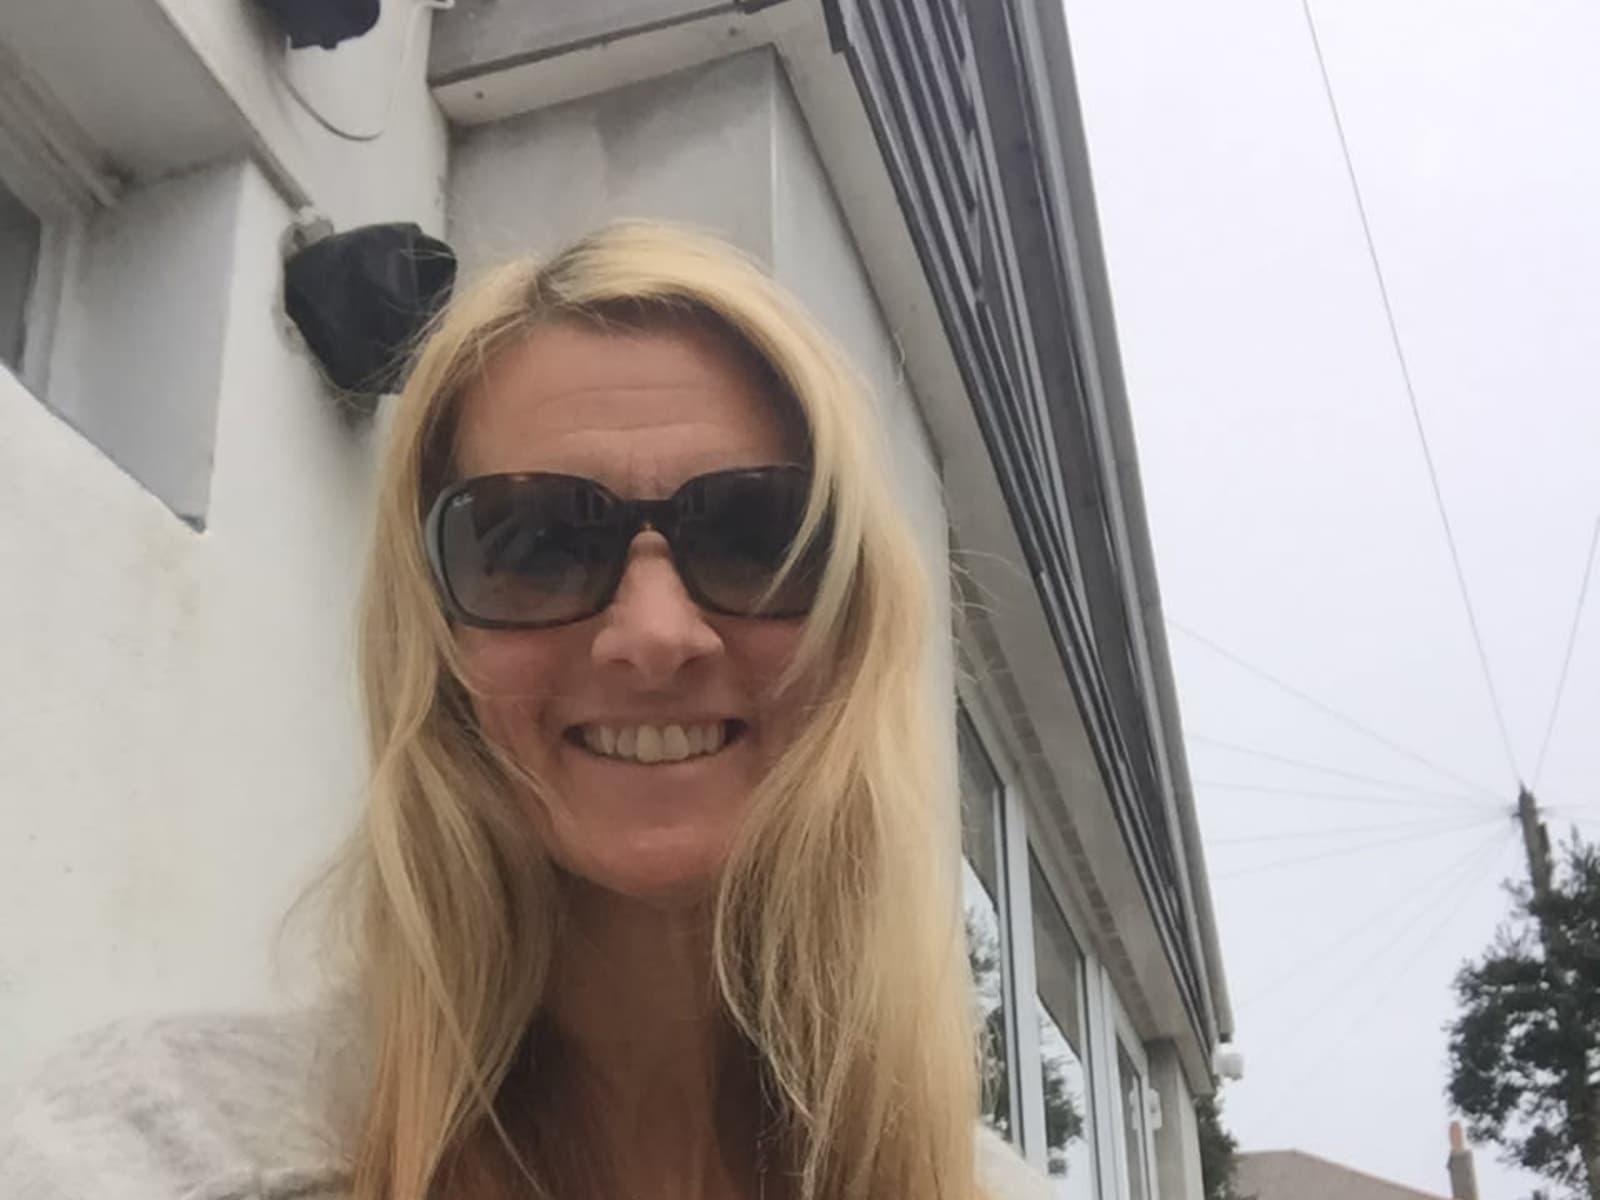 Maryellen from Falmouth, United Kingdom